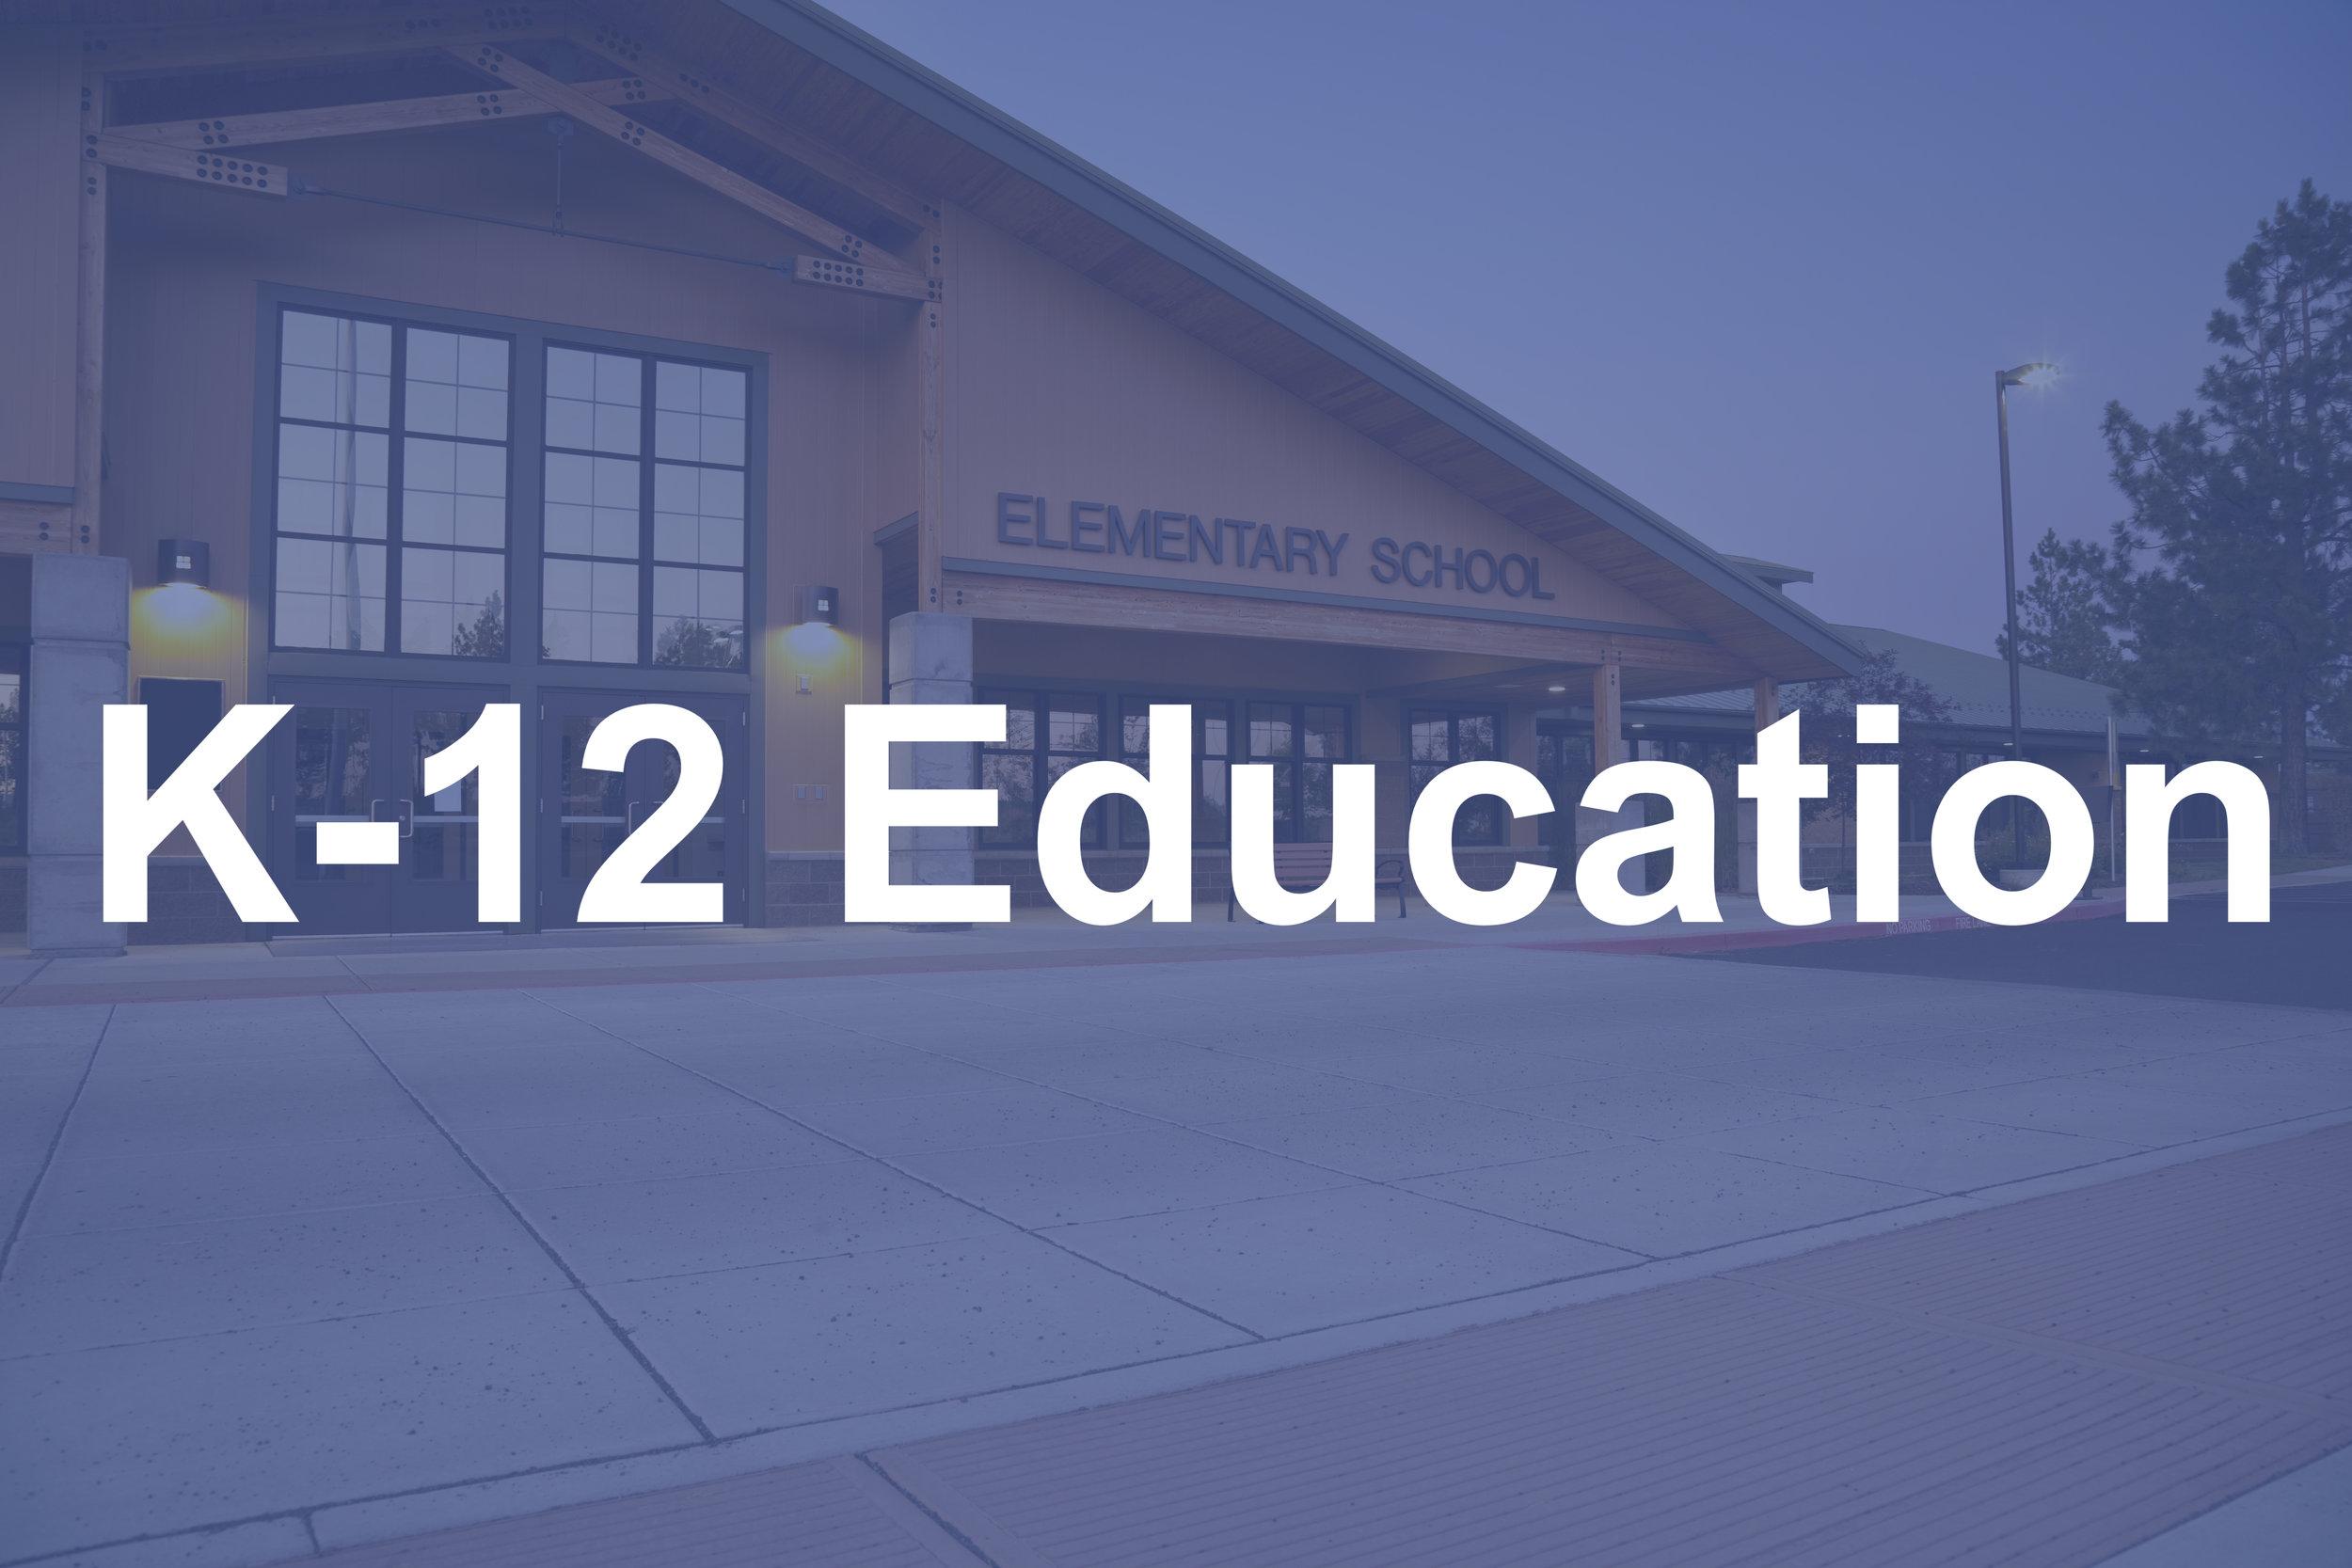 Education_K12_iStock_000017451066_XXXLarge.jpg